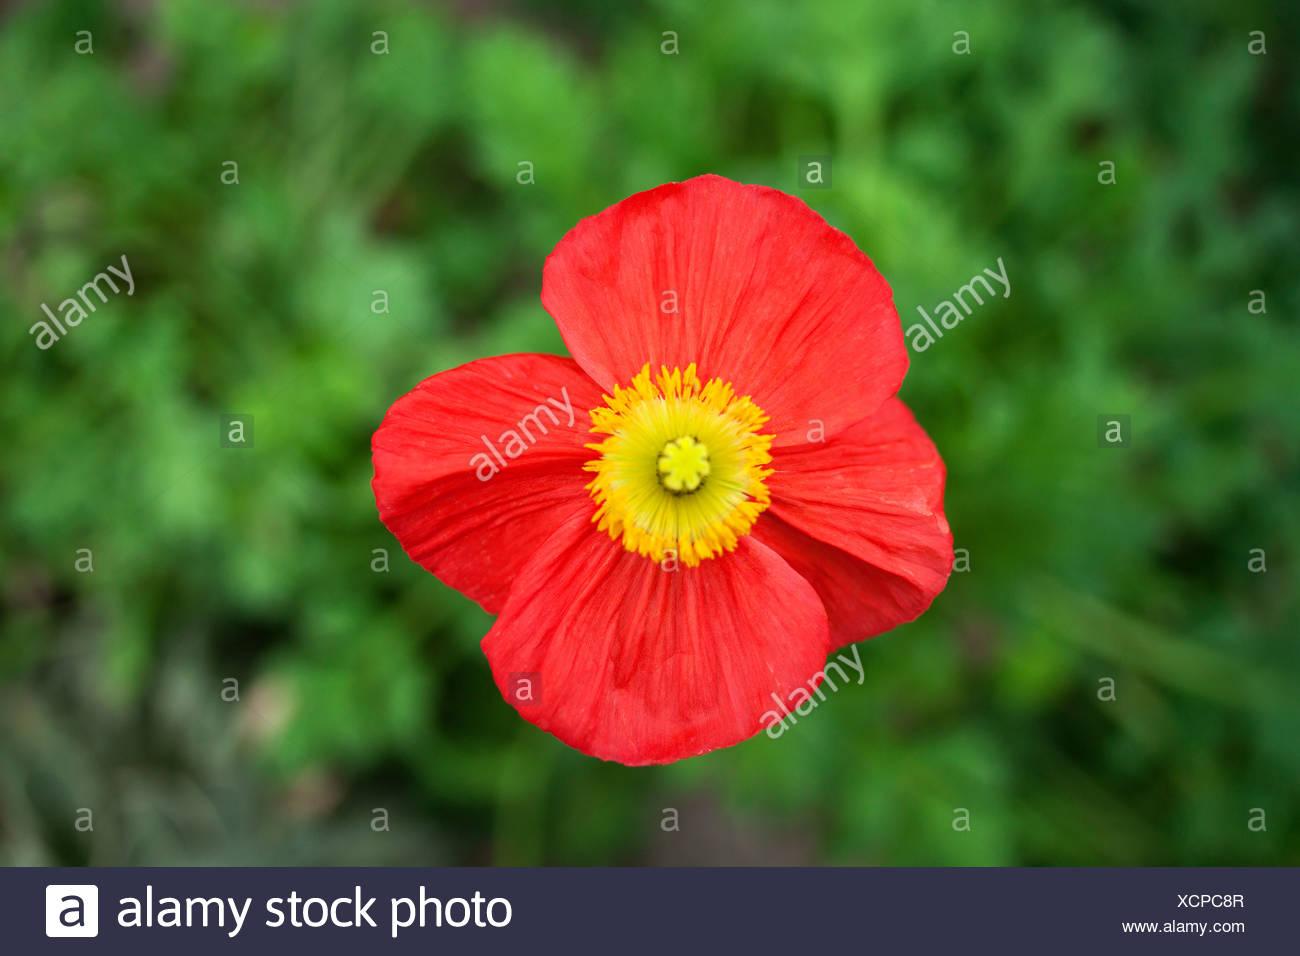 Close Up Of Poppy Flower Stock Photo 283234359 Alamy